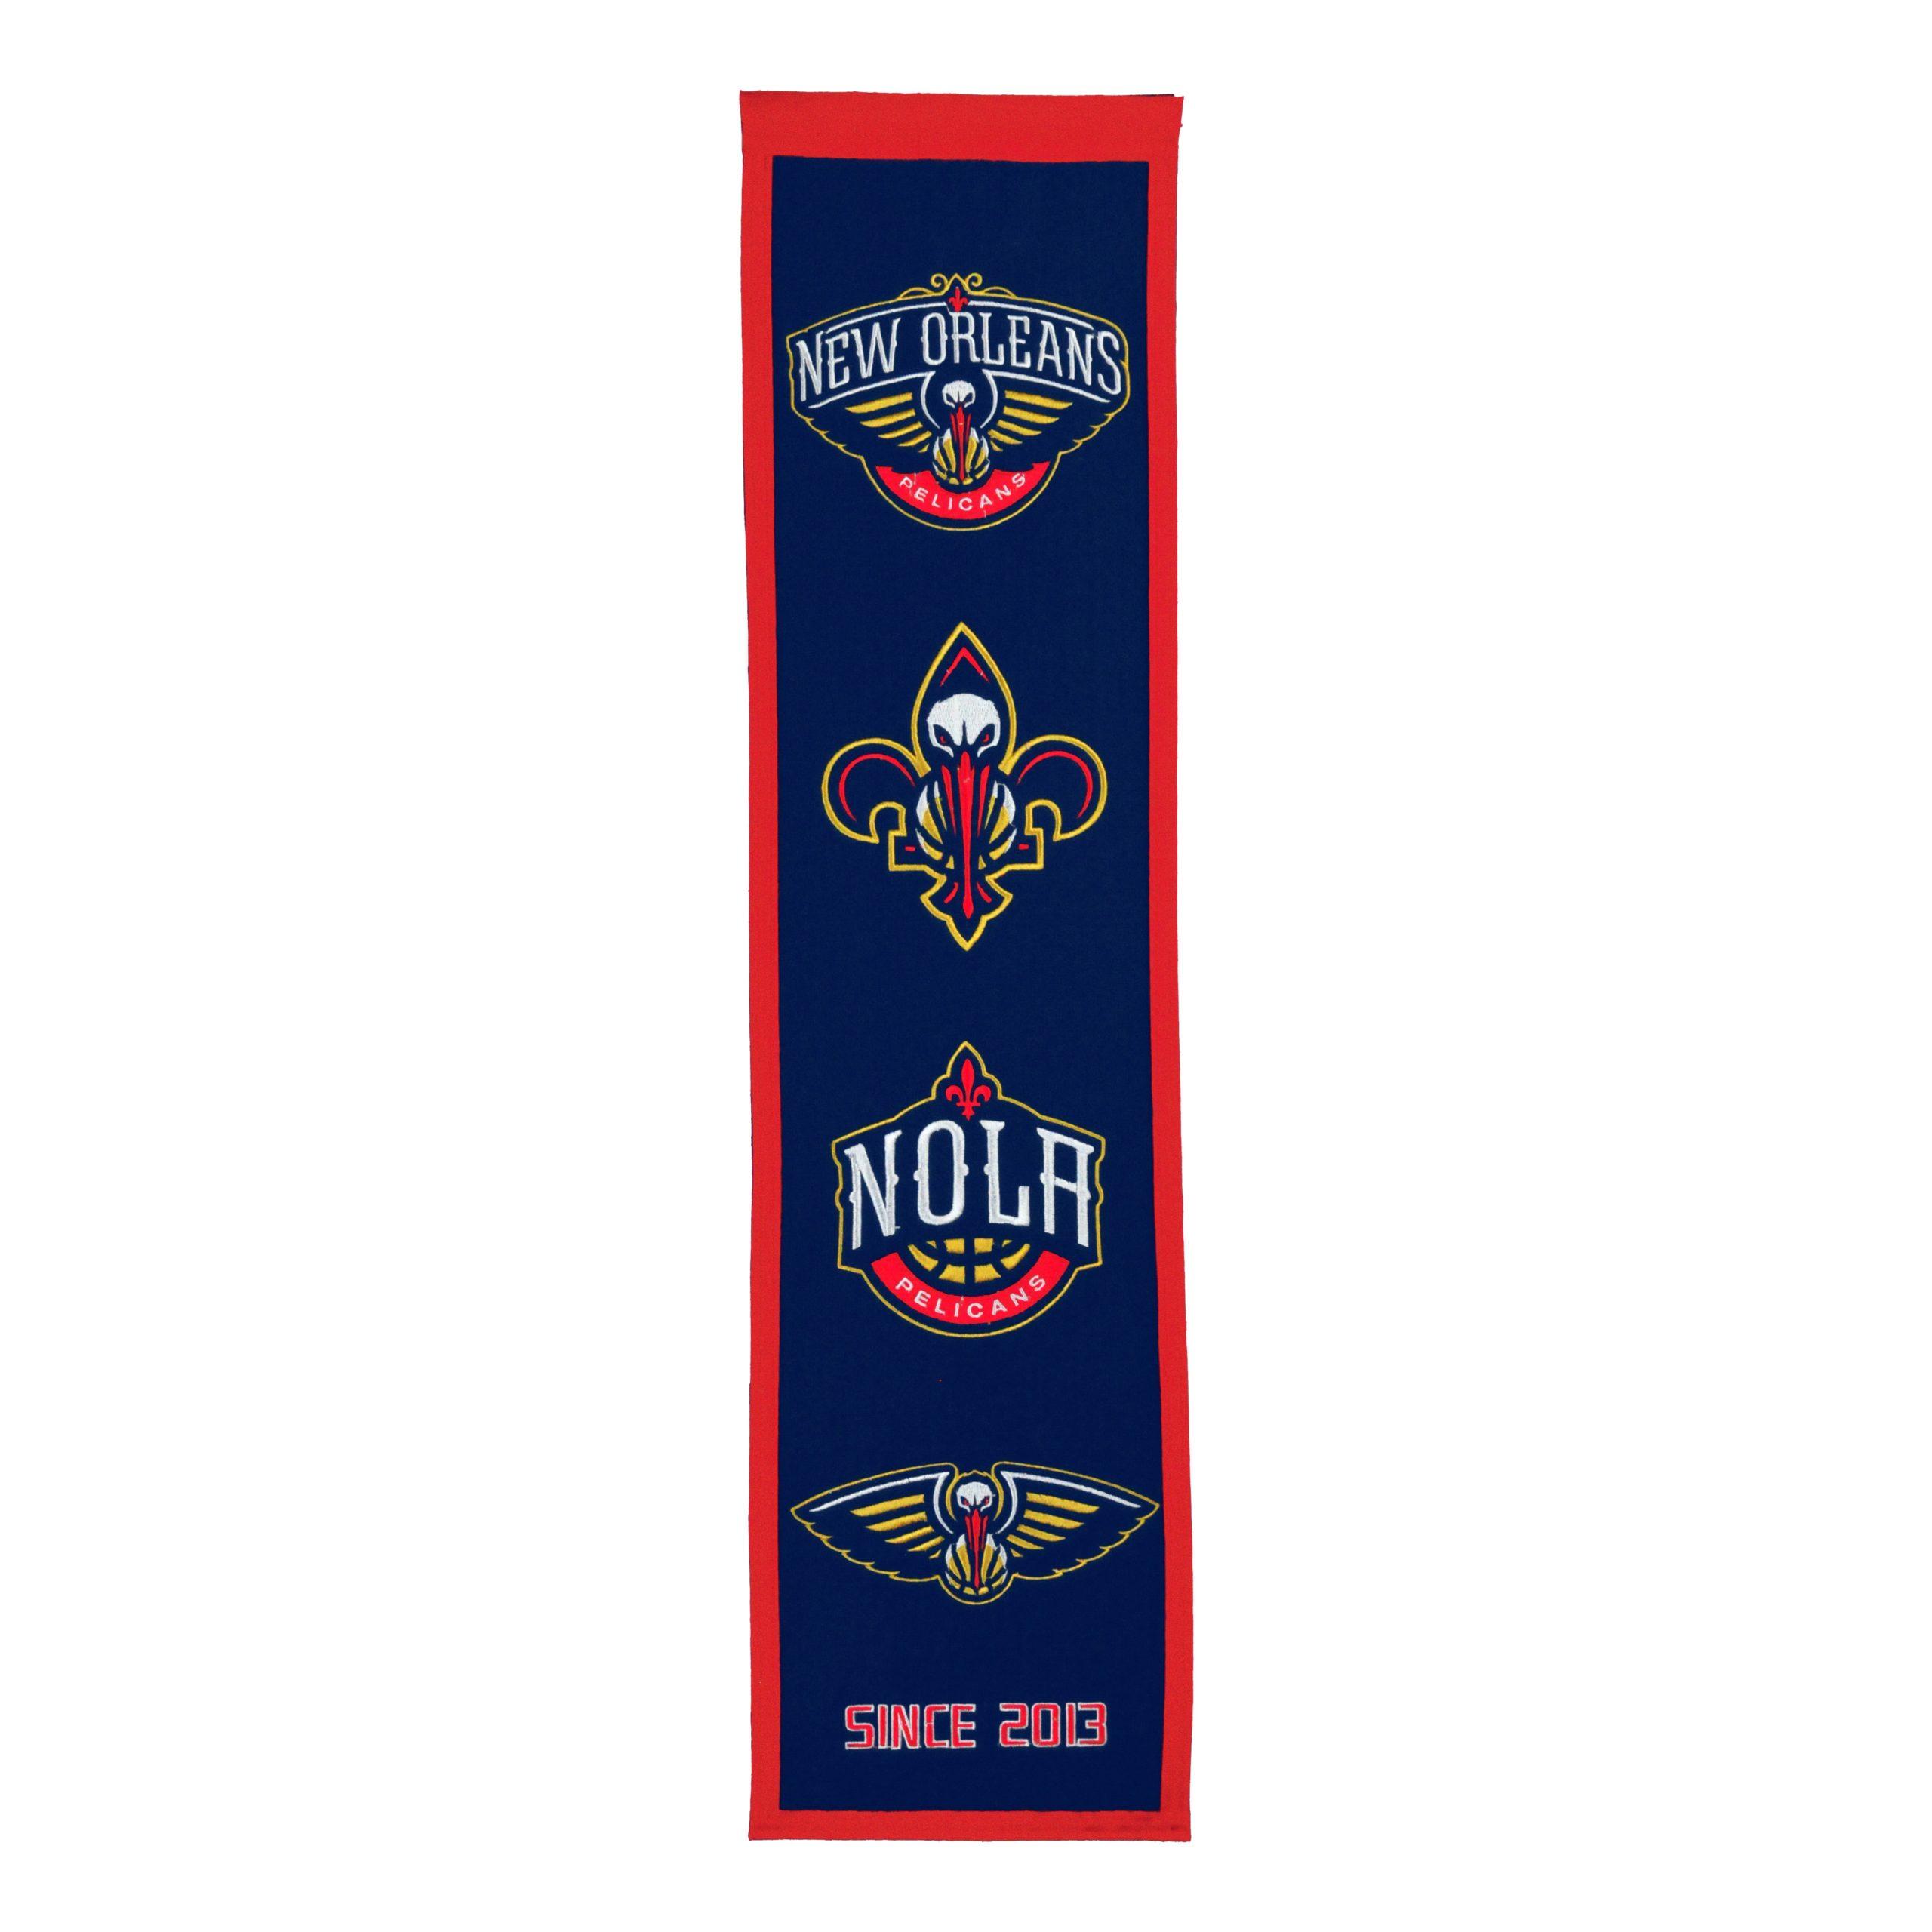 "New Orleans Pelicans 8"" x 32"" Premium Heritage Banner"